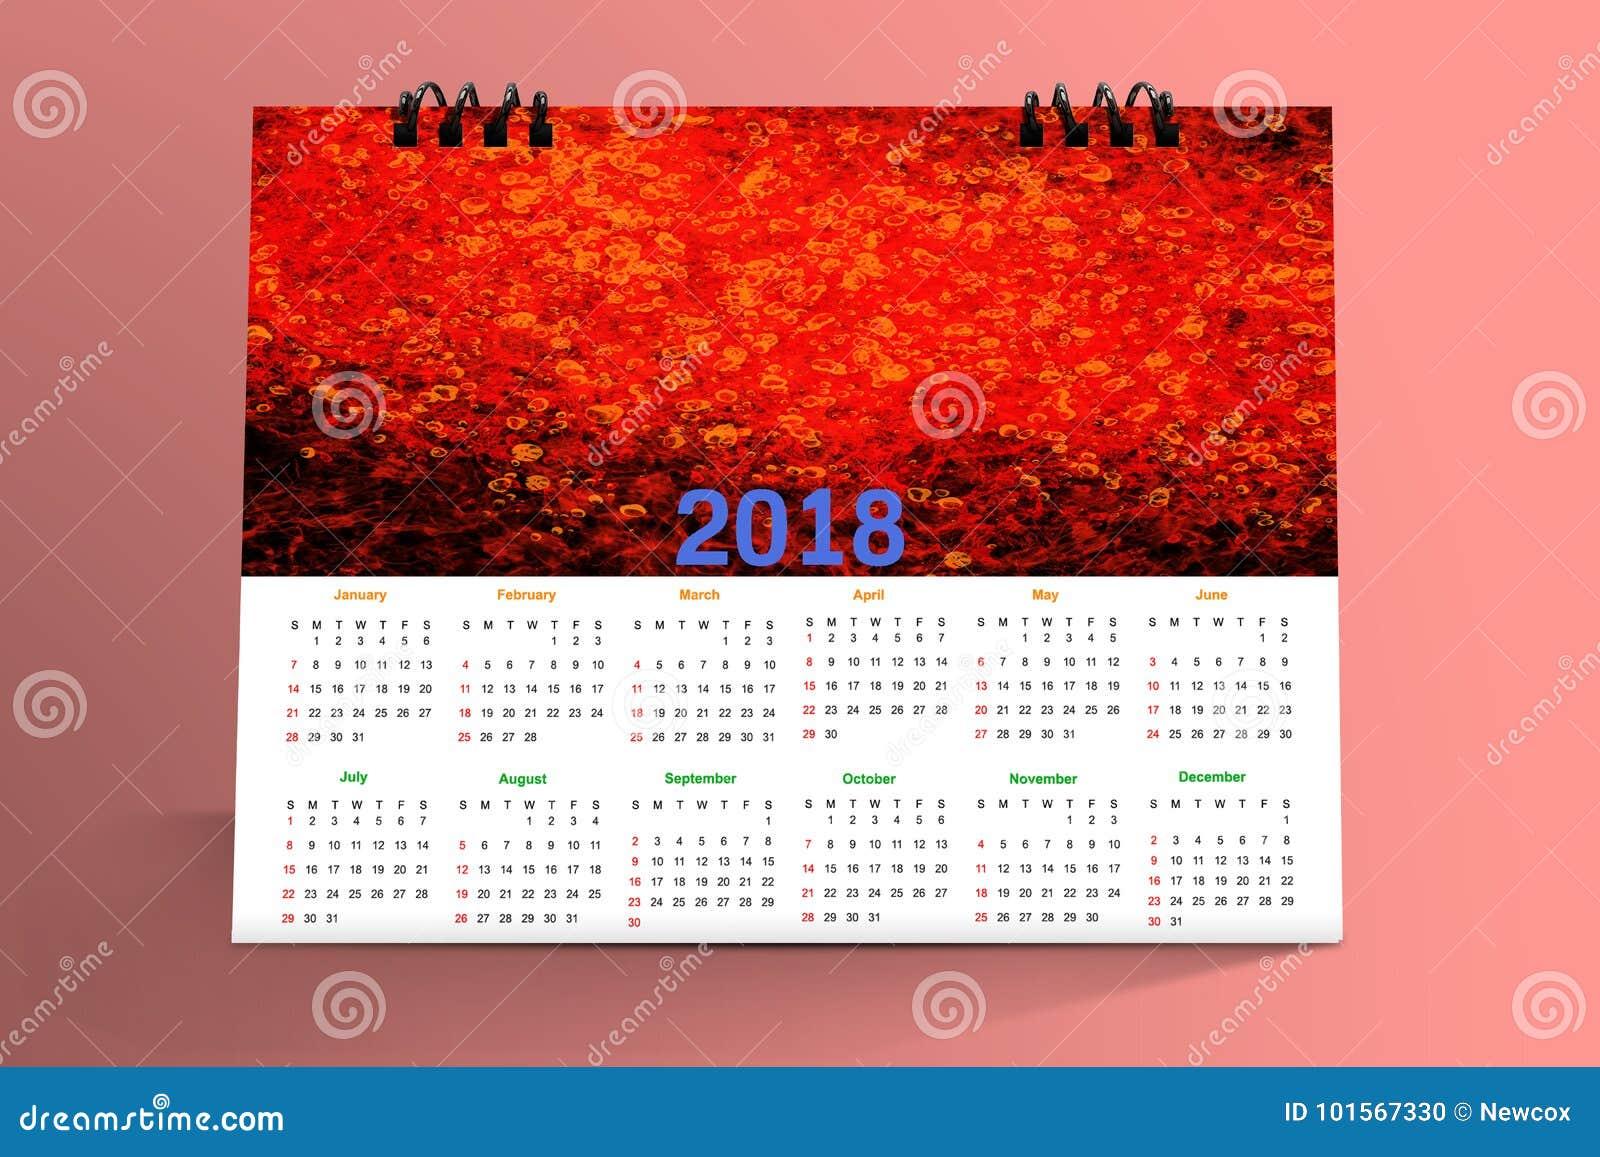 Desktop Calendar Design : Months desktop calendar design stock photo image